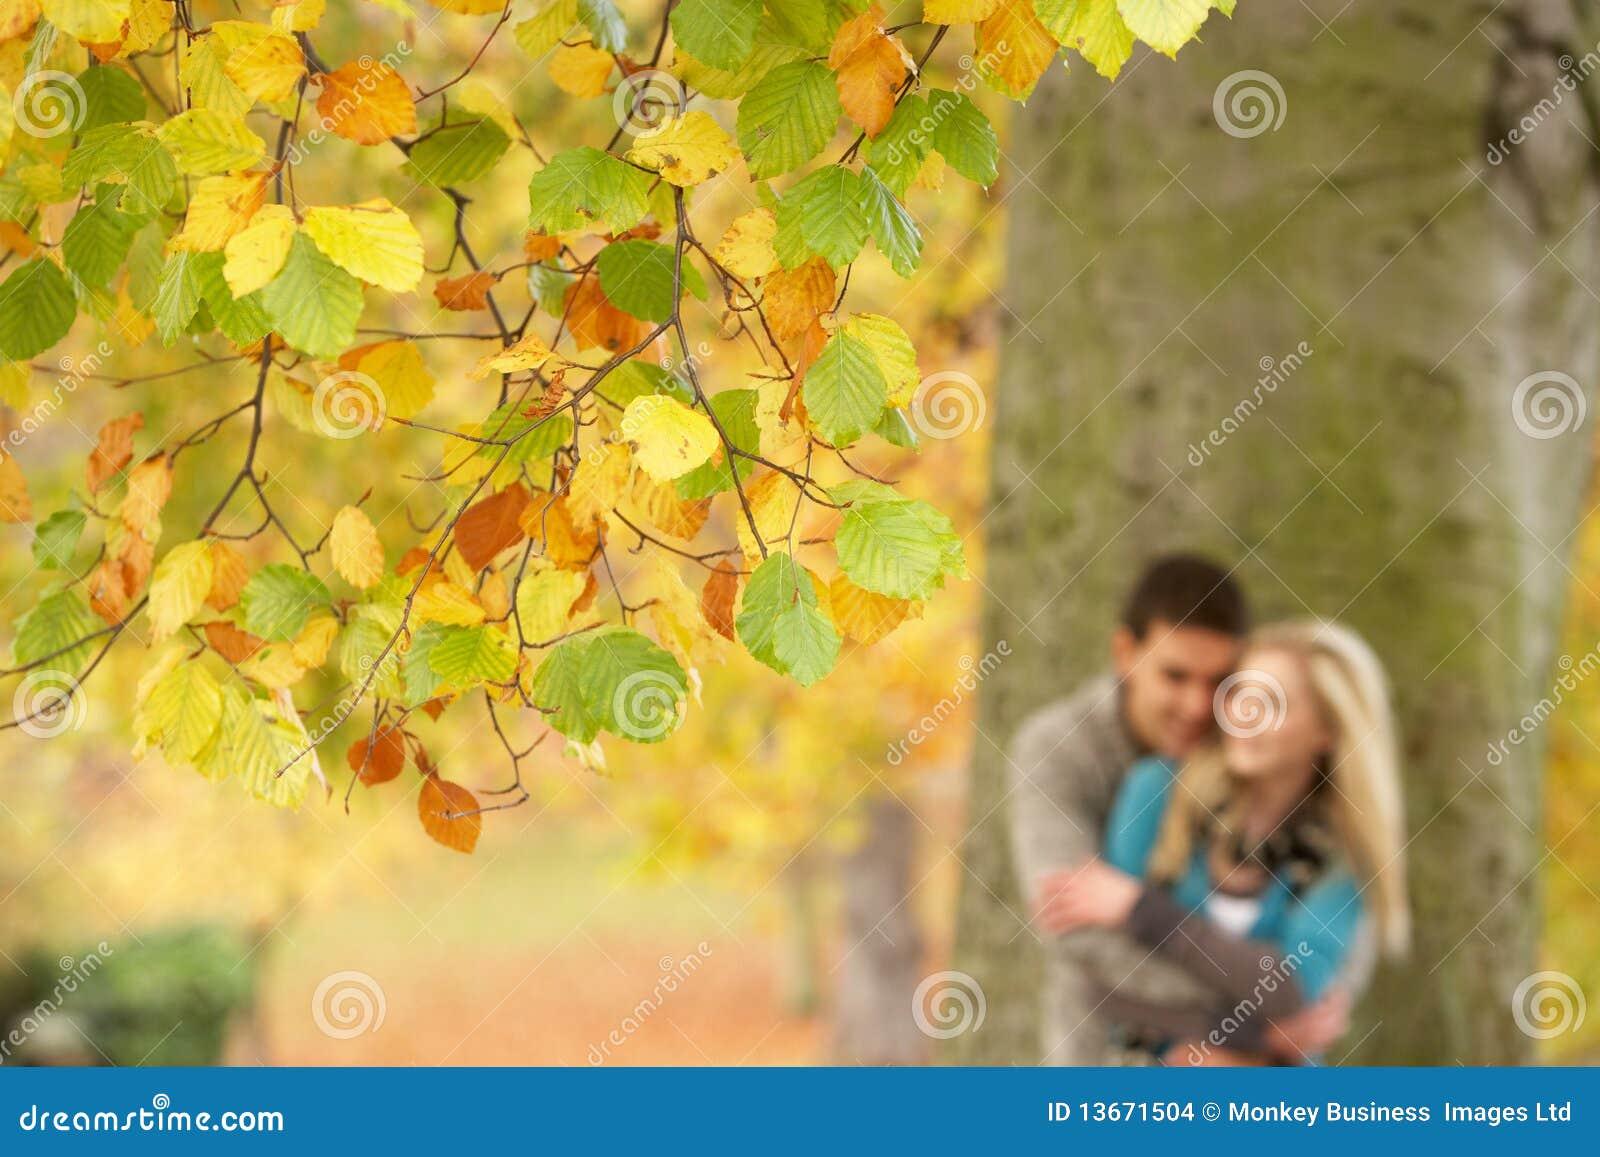 Shallow Focus View Of Romantic Teenage Couple